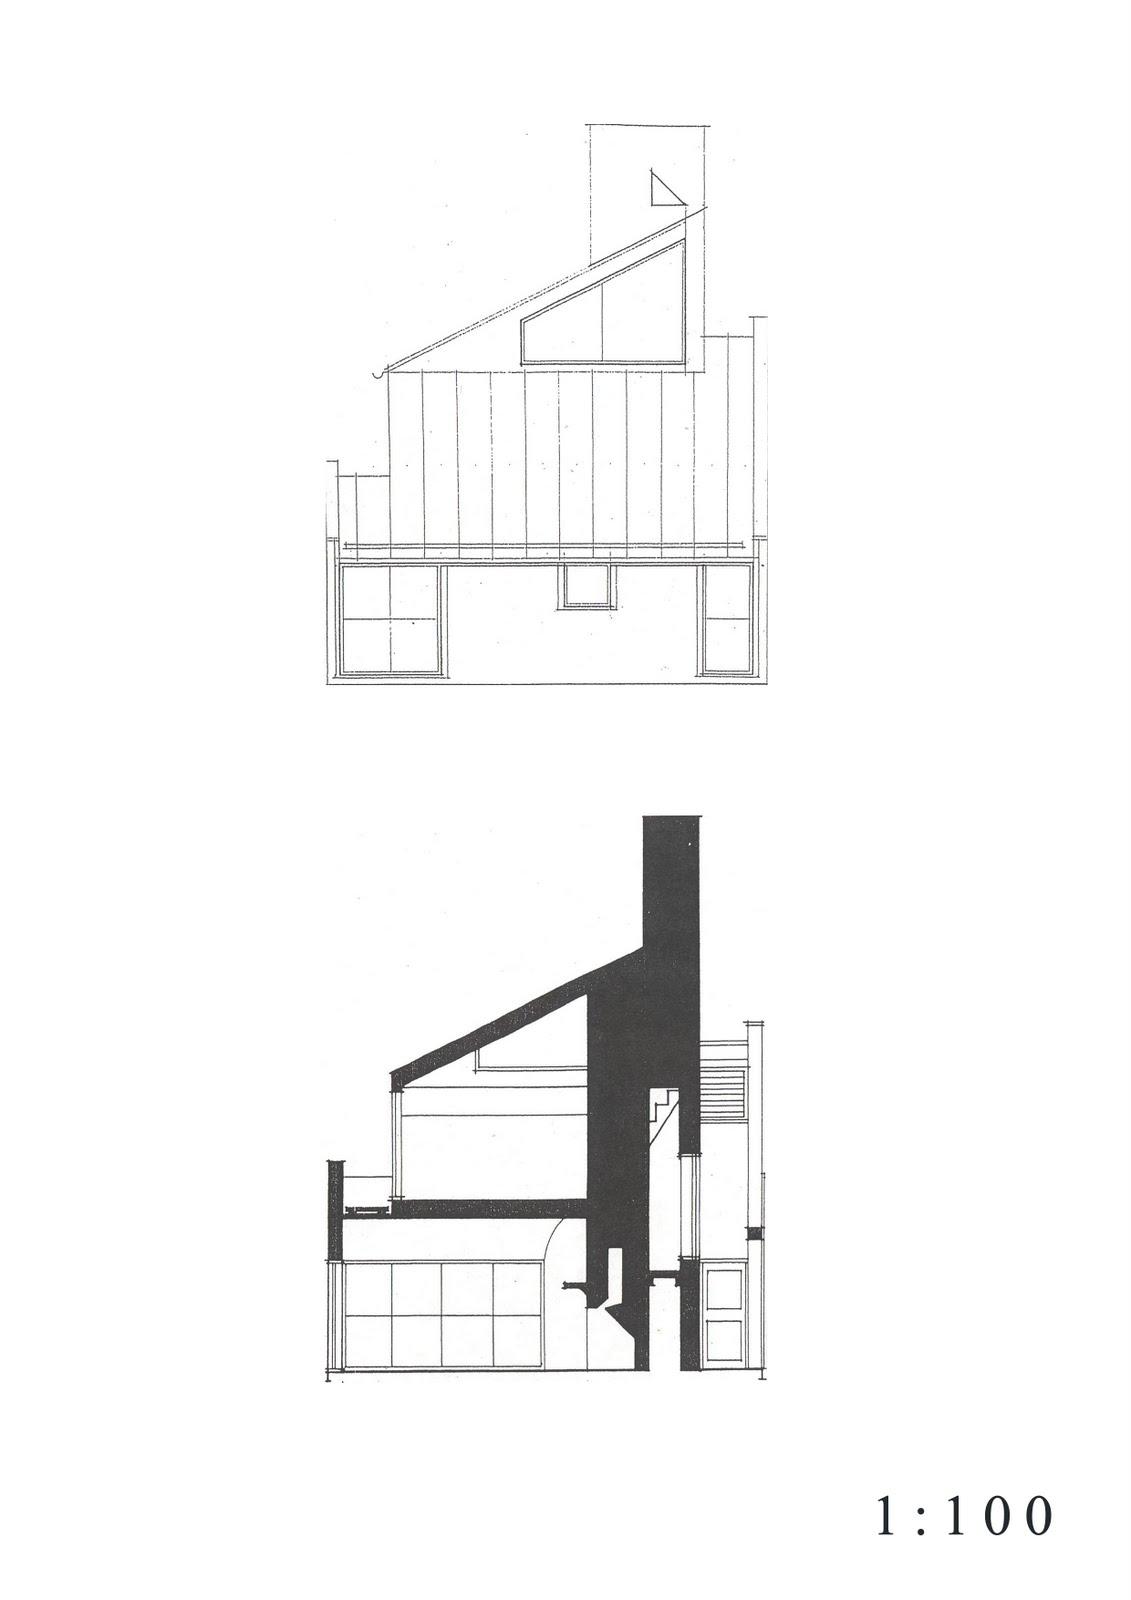 Scale100_A4_03 Vanna Venturi House Plan Section Elevation on fisher house elevation, vanna venturi interior, kaufmann house elevation, eames house elevation, vanna venturi sections dimensions, tugendhat house elevation,